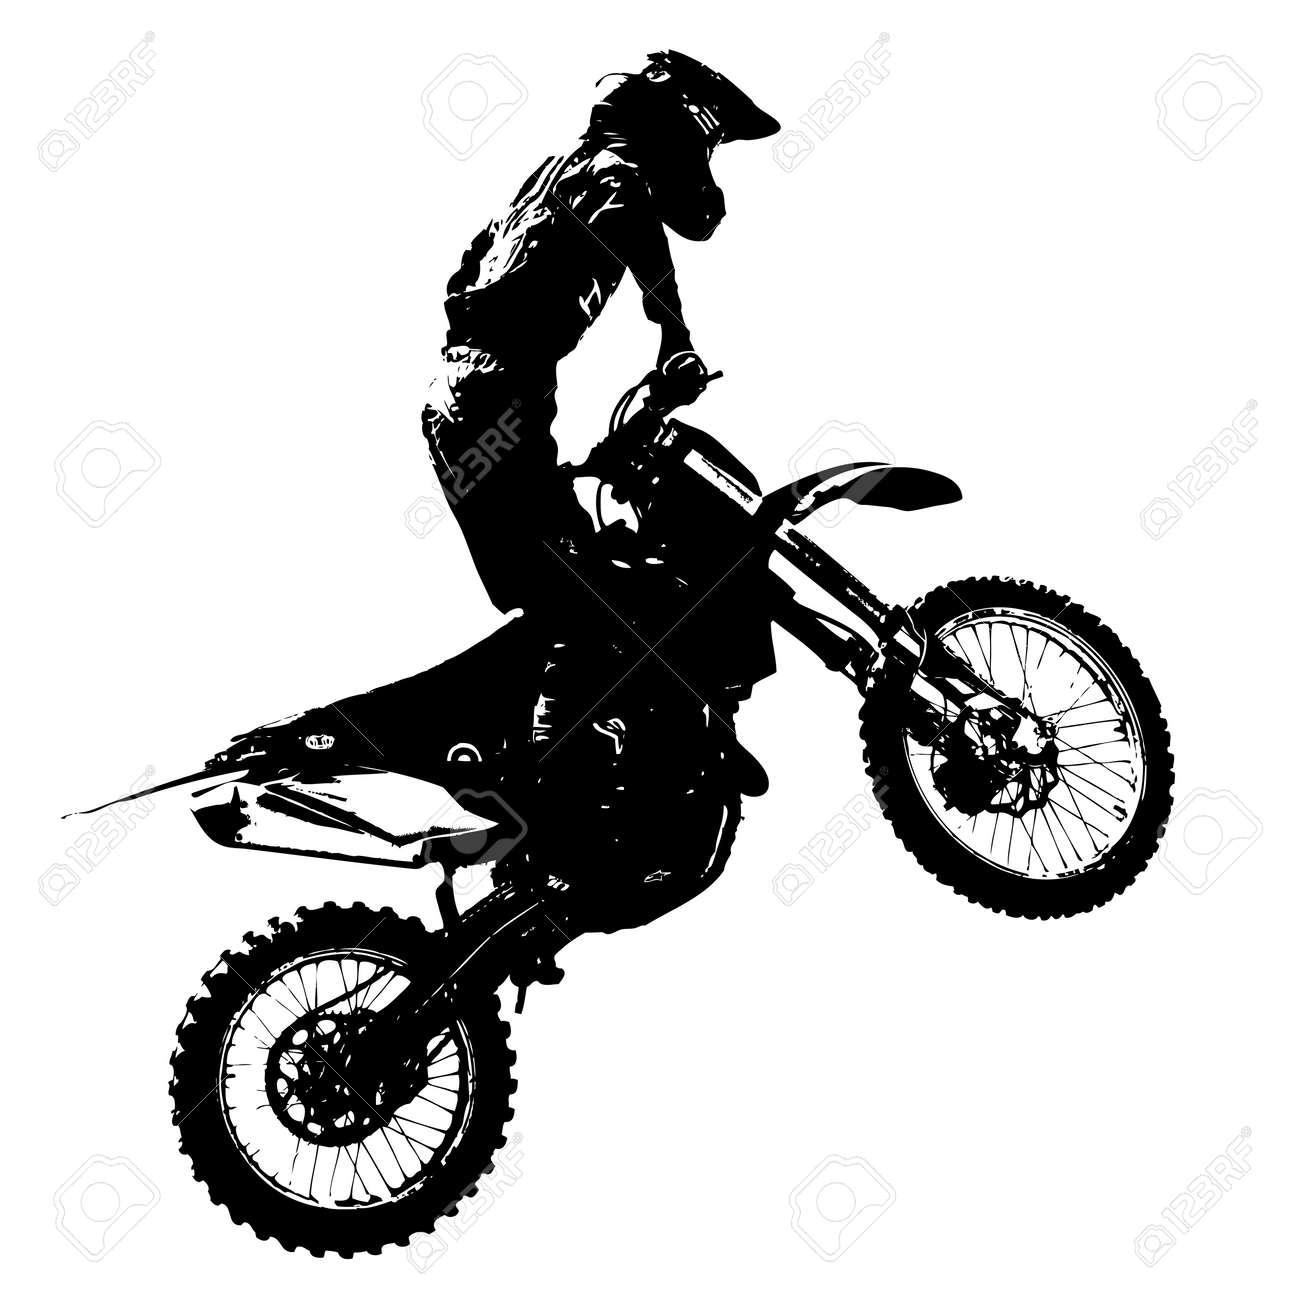 Rider participates motocross championship. Vector illustration. - 39162339